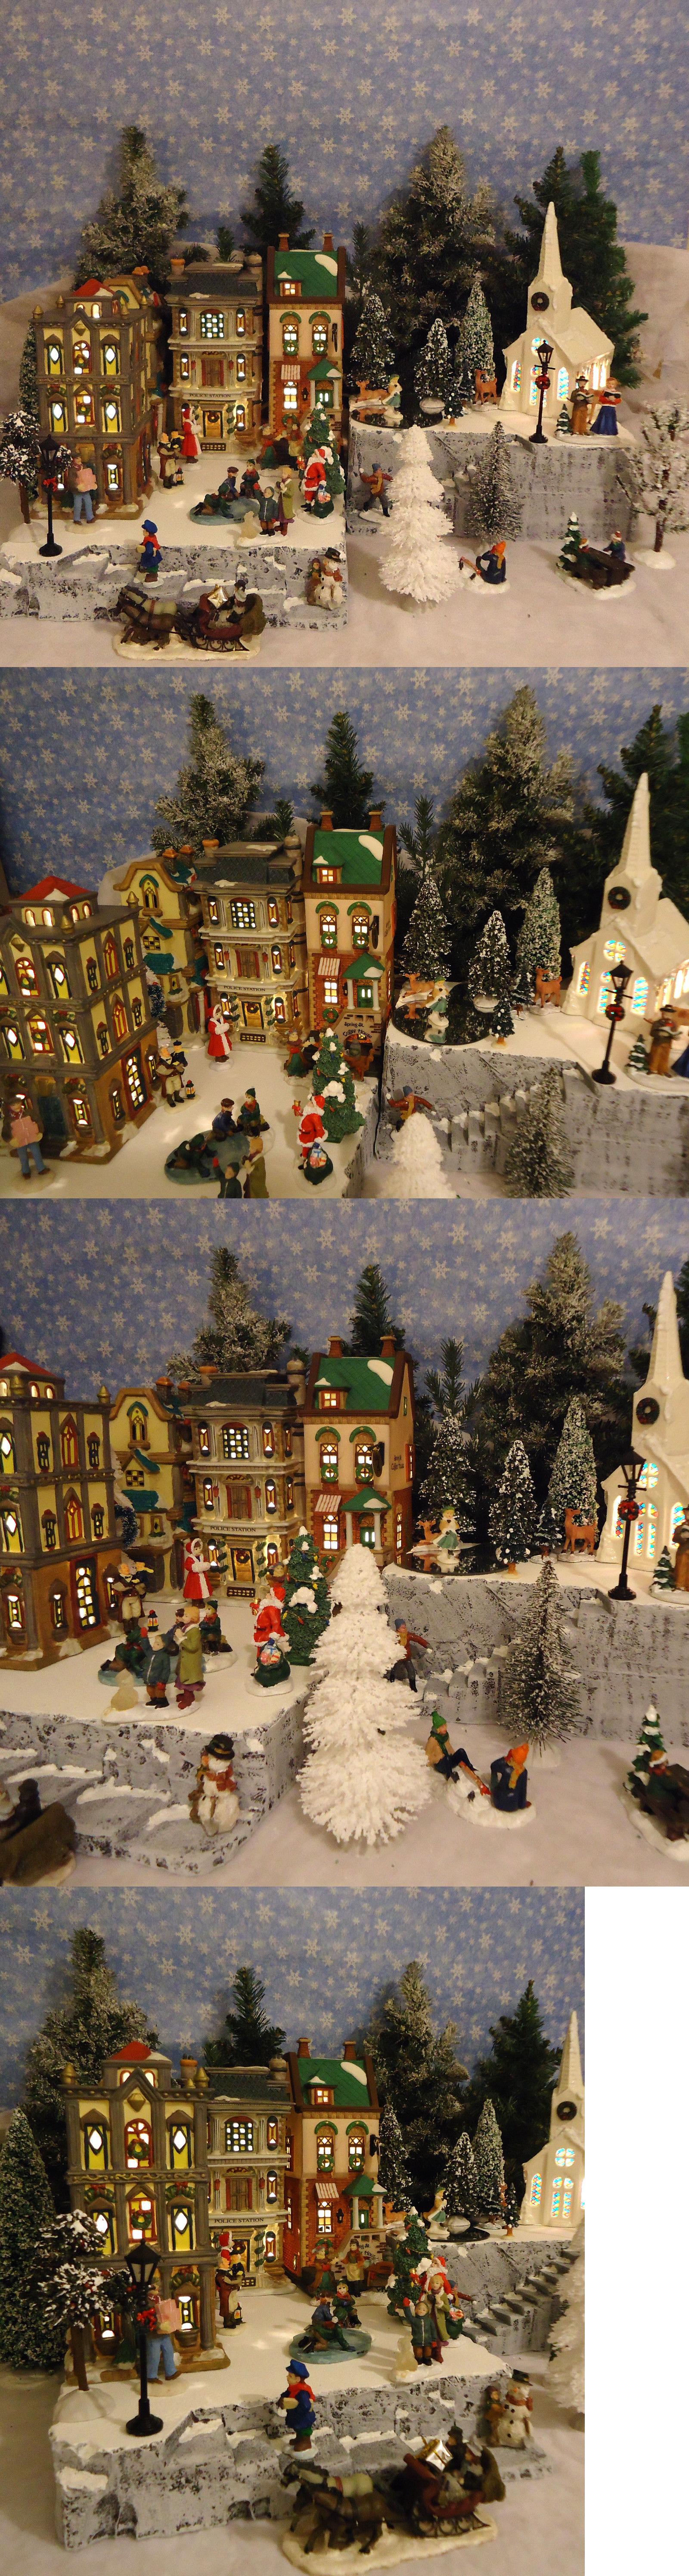 Department 56 dickens village display ideas - Christmas Collectible Department 56 Christmas Snow Village Display Platform Base Dept 56 Lemax St